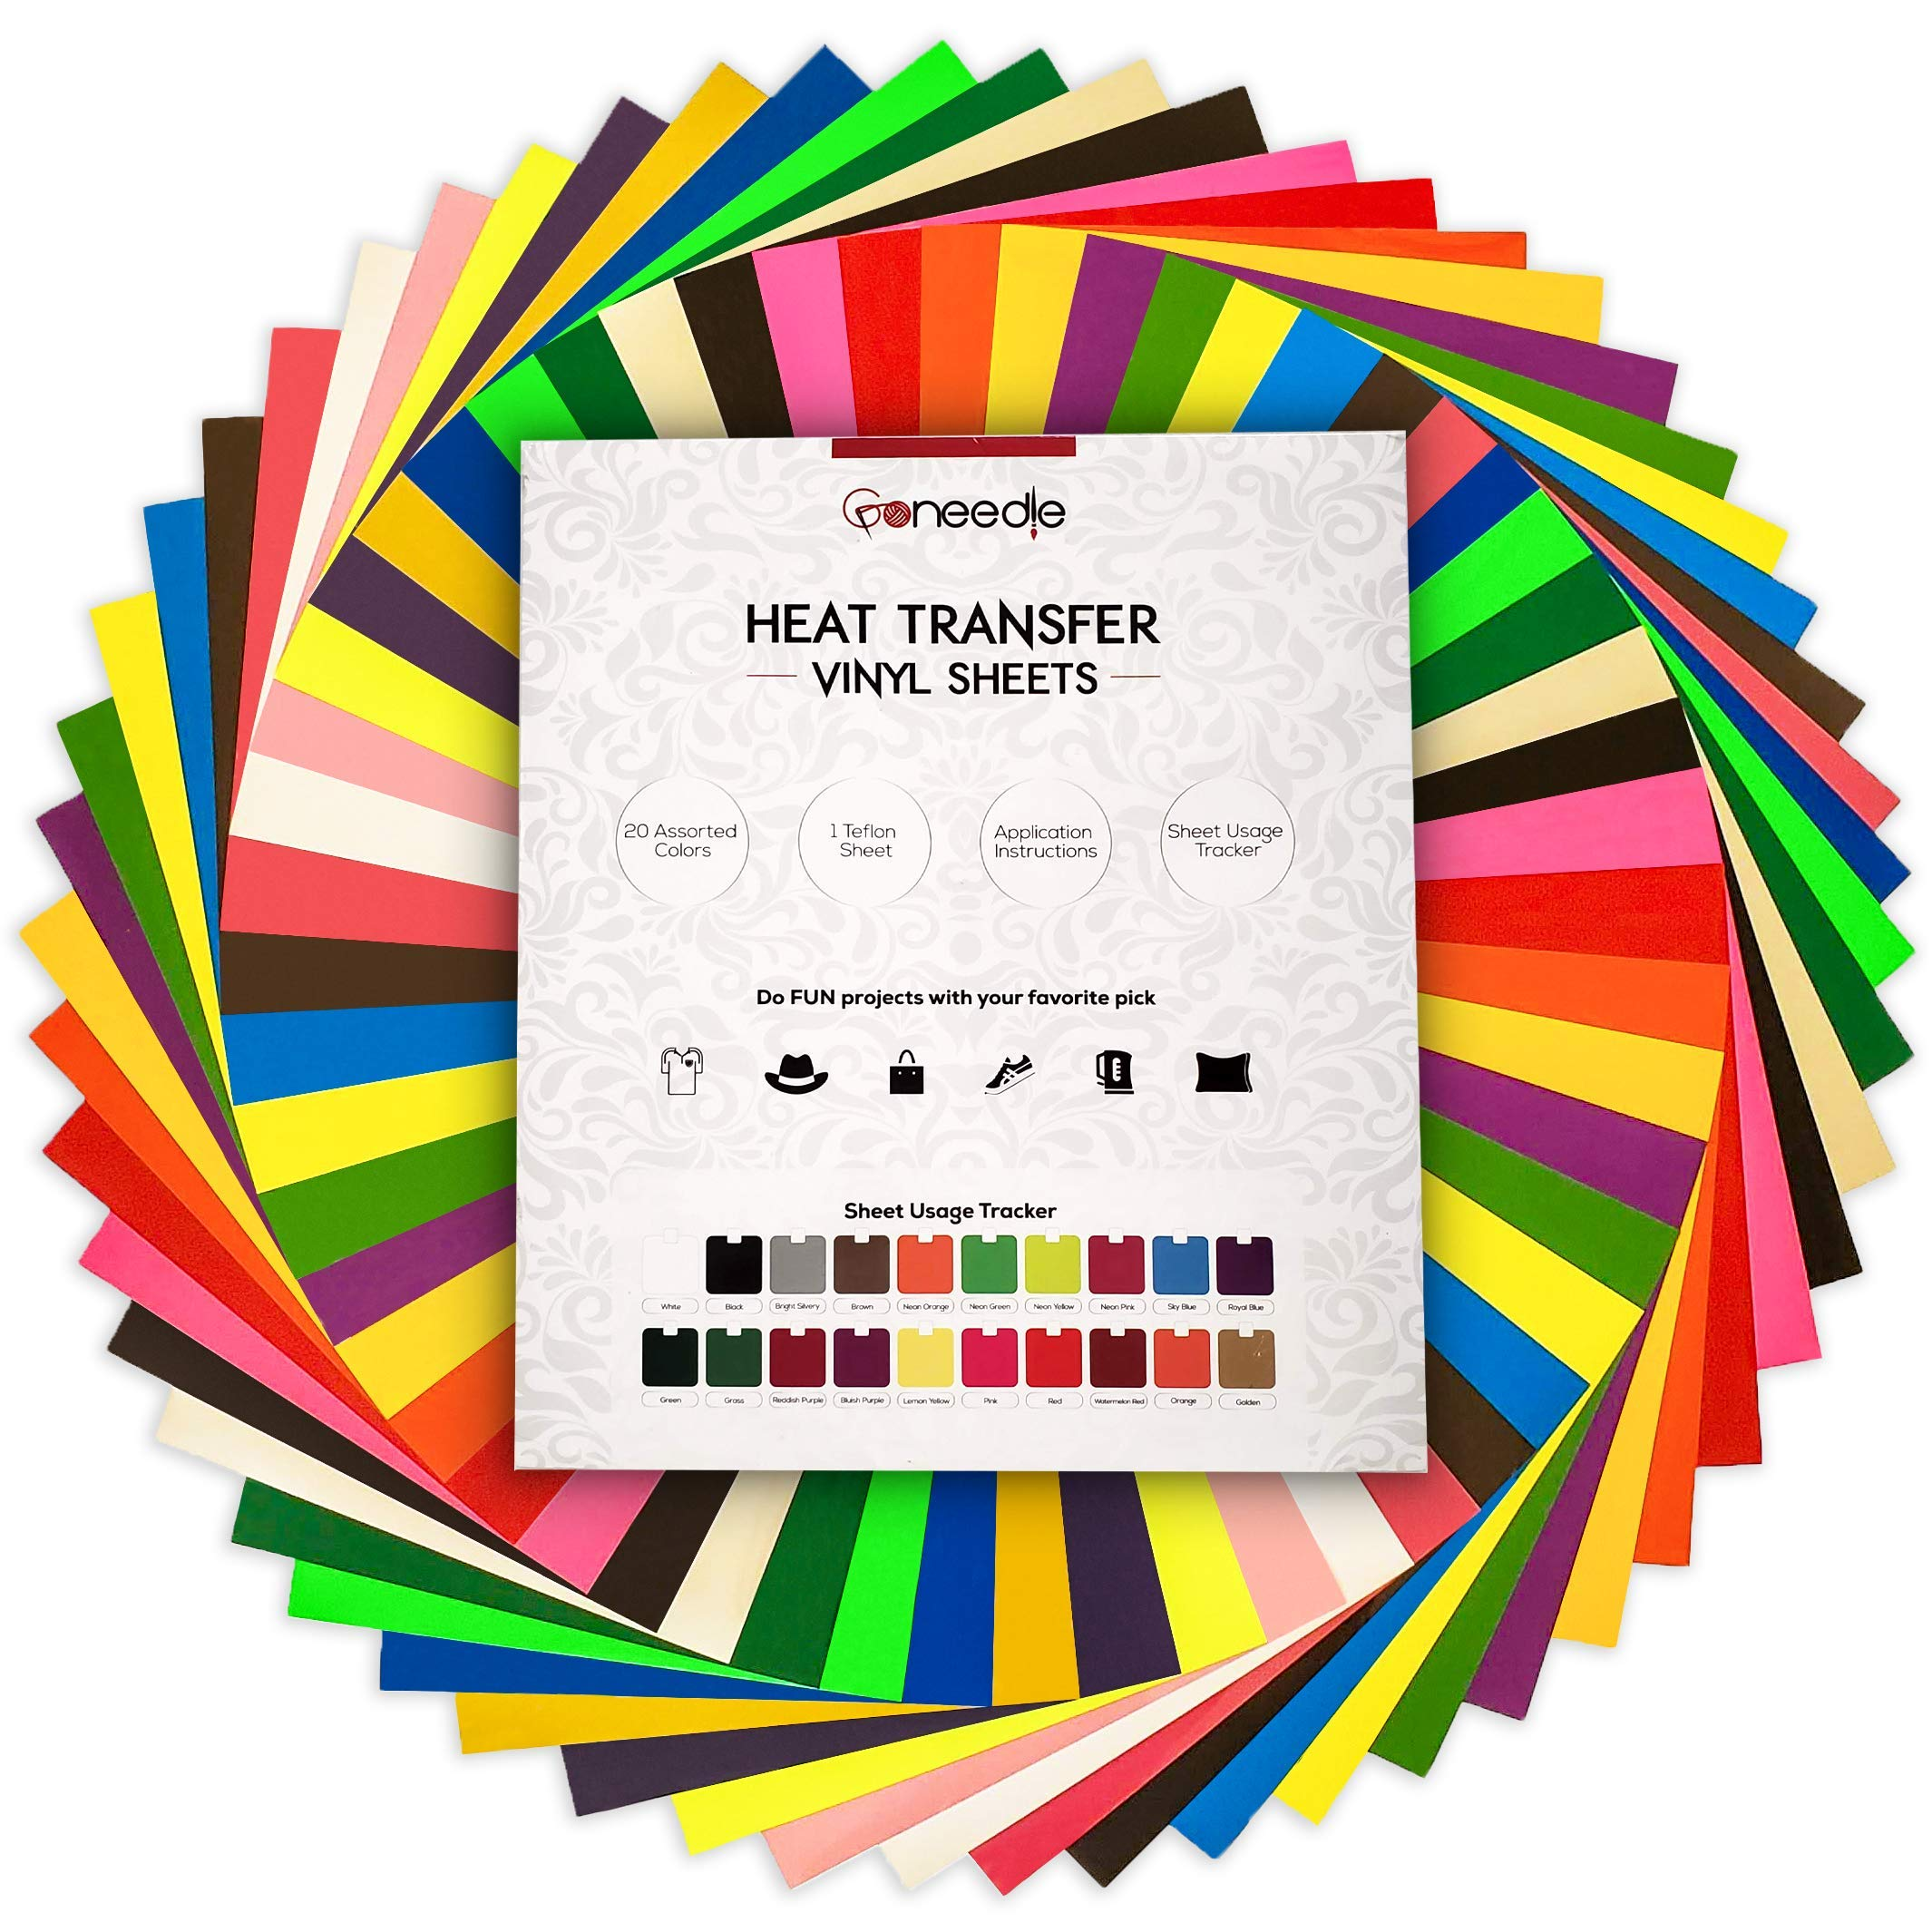 Heat Transfer Vinyl HTV Bundle: 20 Pack Assorted Colors 12''x10'' Sheets for DIY Iron On T-Shirts Fabrics - Seamless Integration with Cricut, Silhouette Cameo, Heat Press Machines   Bonus Teflon Sheet by Goneedle